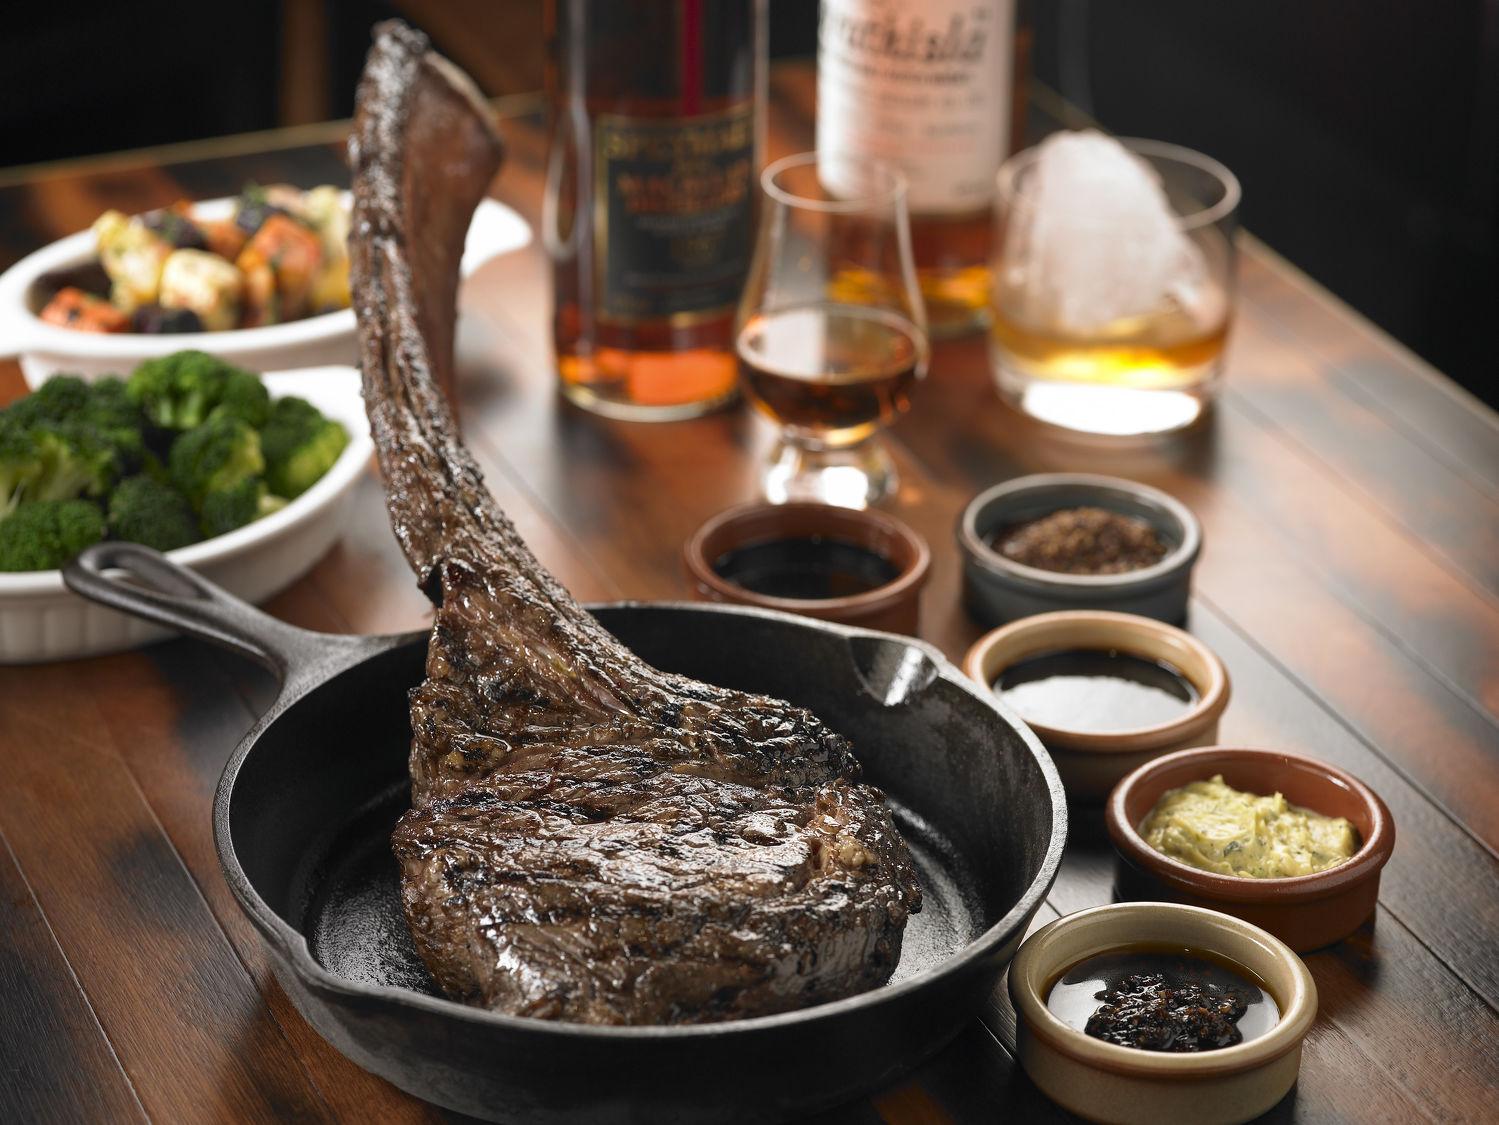 Bedrock Bar Grill Tomahawk Steak - THE EDGE SINGAPORE